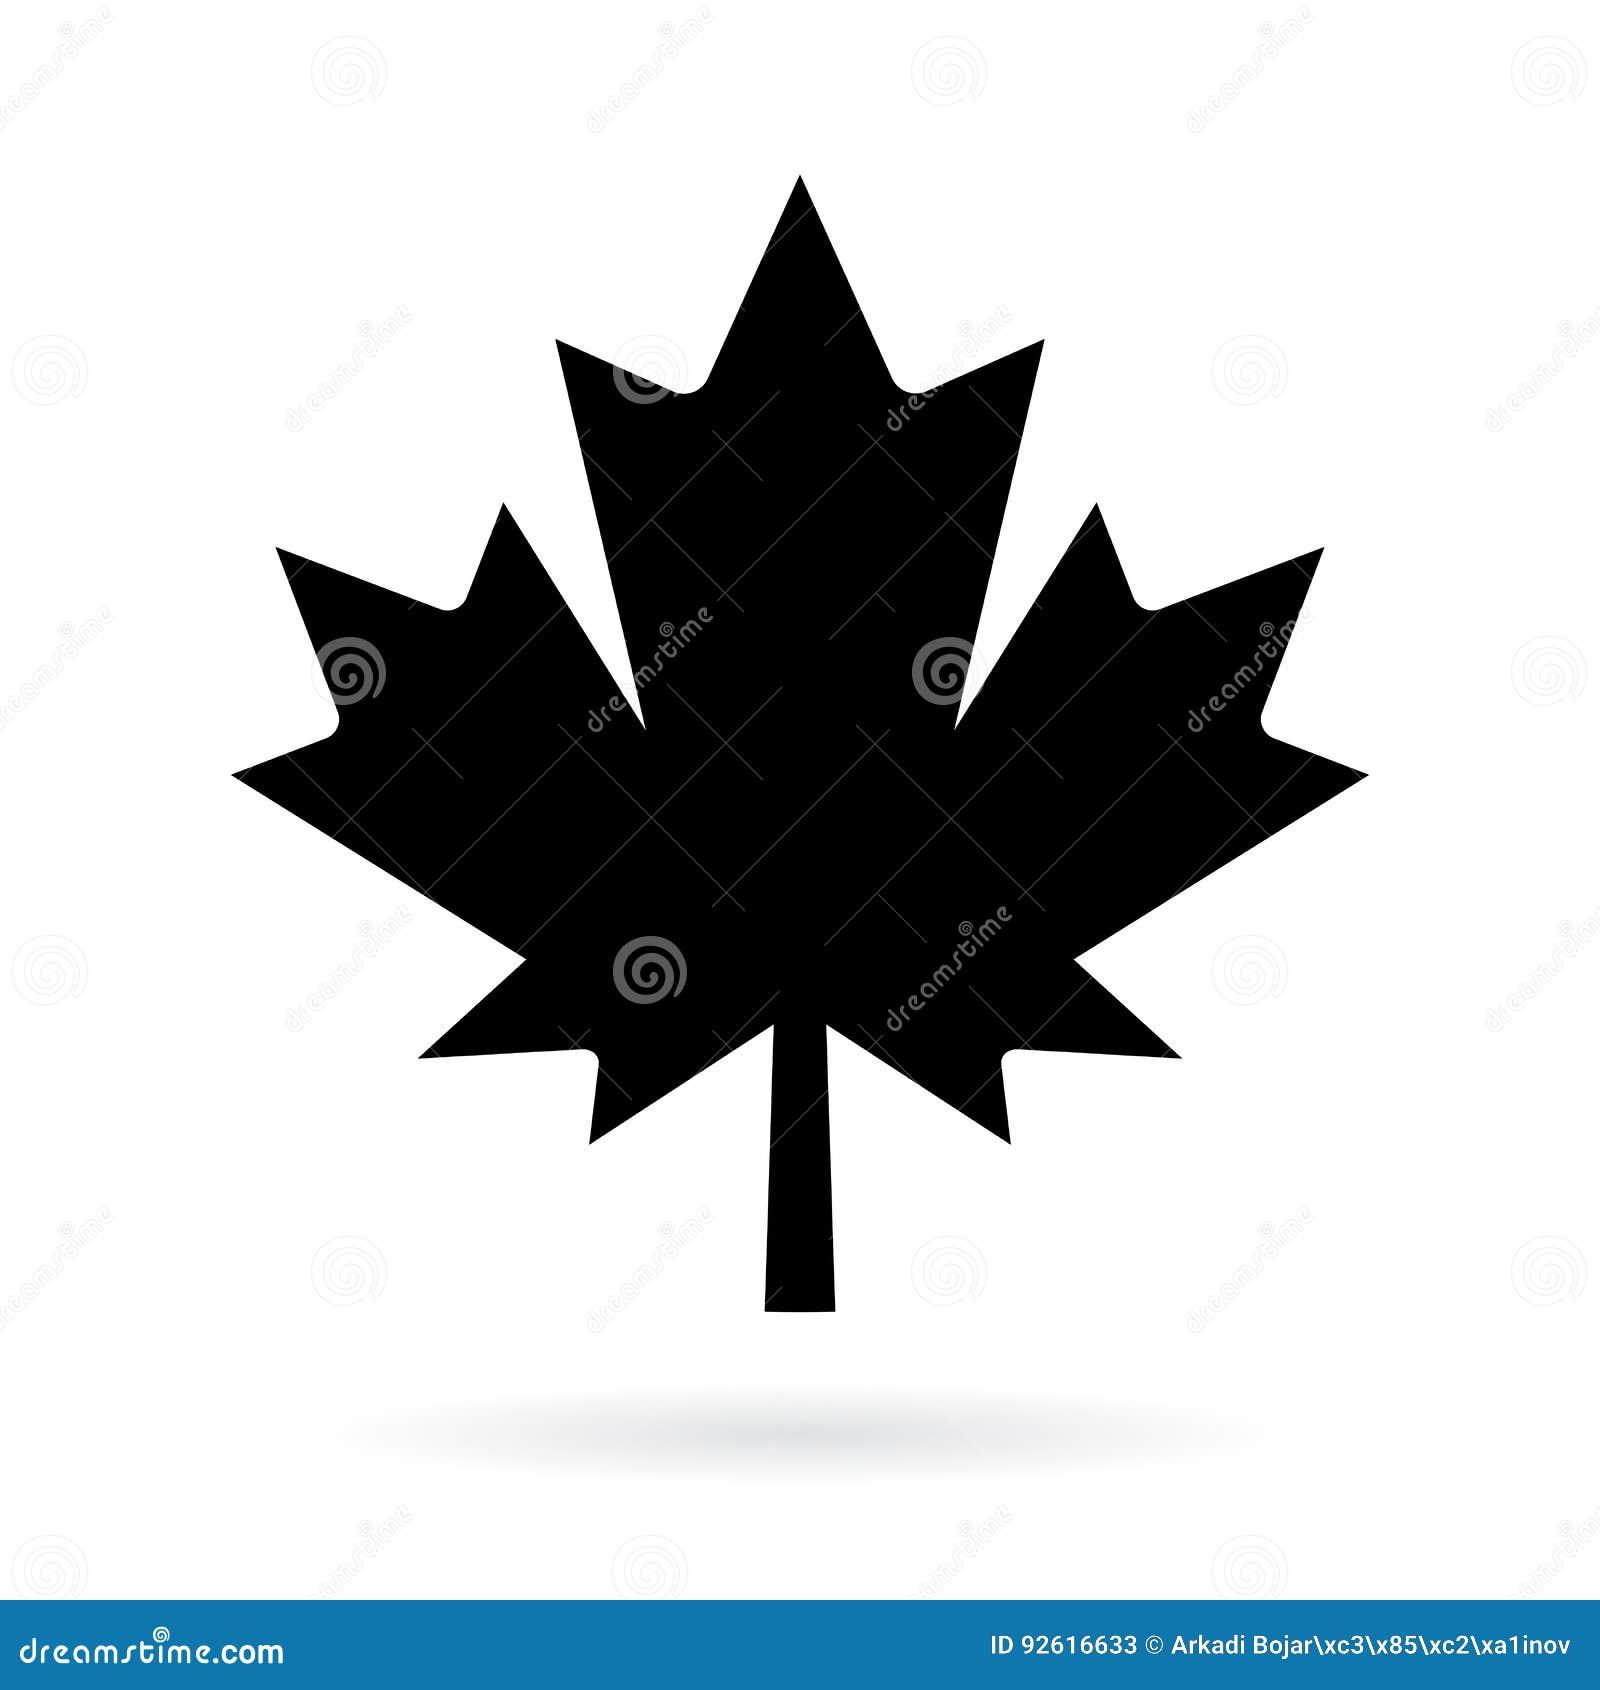 Maple Leaf Vector Pictogram Stock Vector Illustration Of